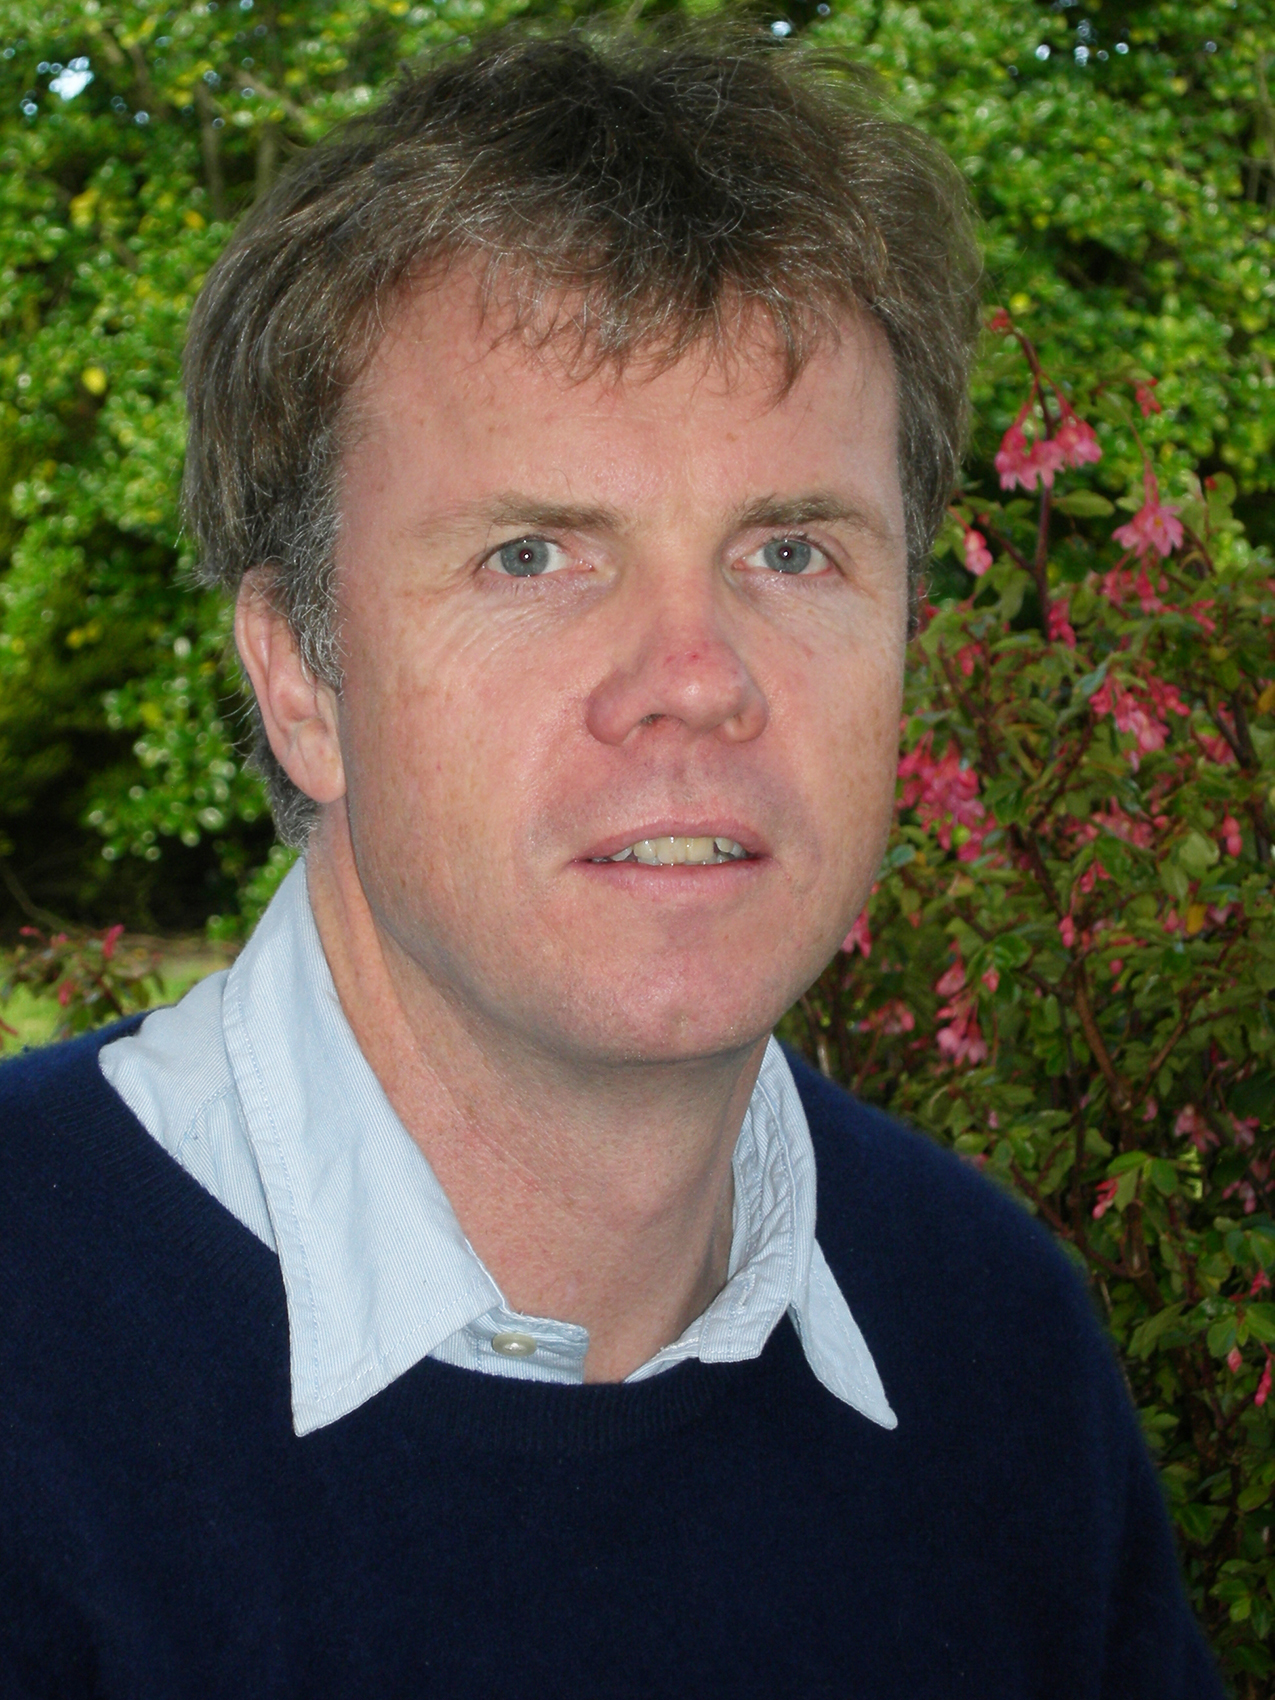 Foley-Stephen-2007.jpg?mtime=20200513115352#asset:3535